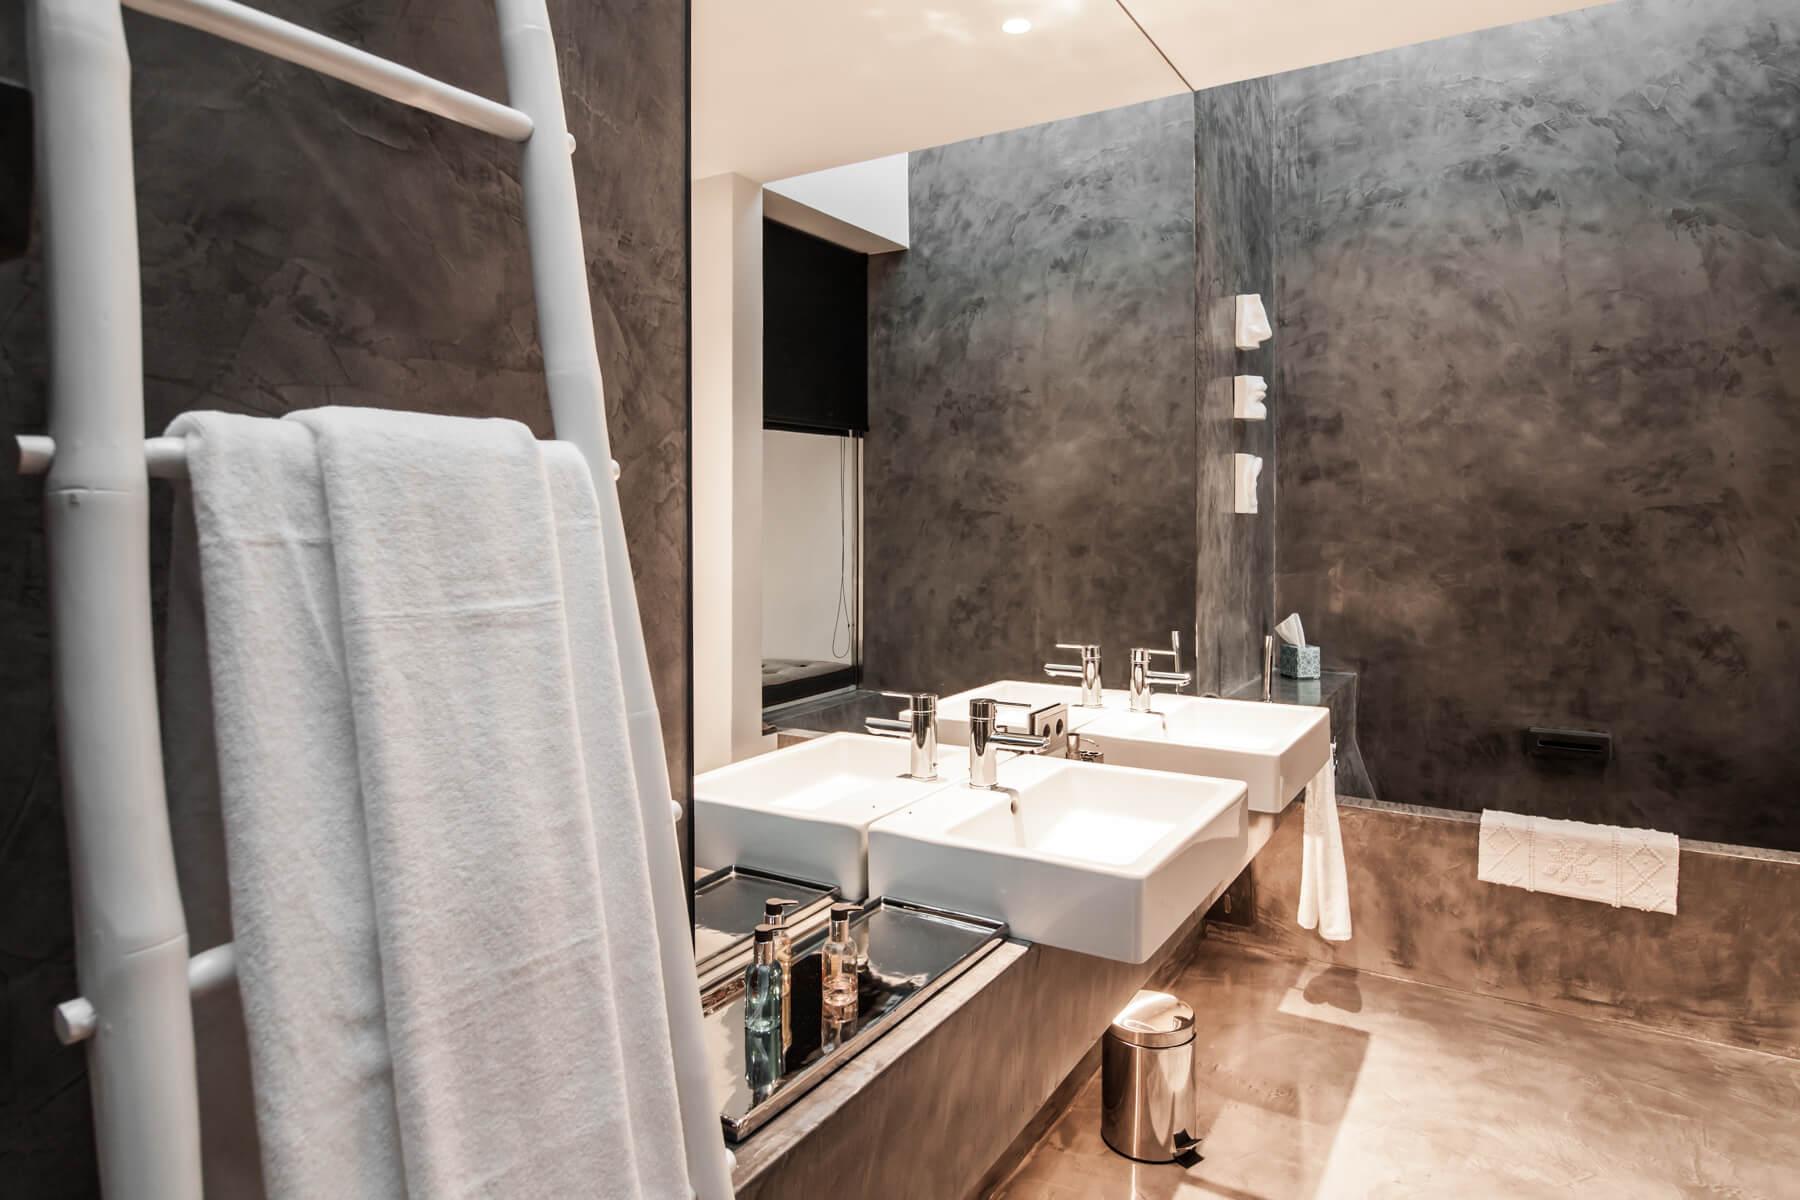 https://www.white-ibiza.com/wp-content/uploads/2020/05/white-ibiza-villas-can-zama-master-bathroom.jpg